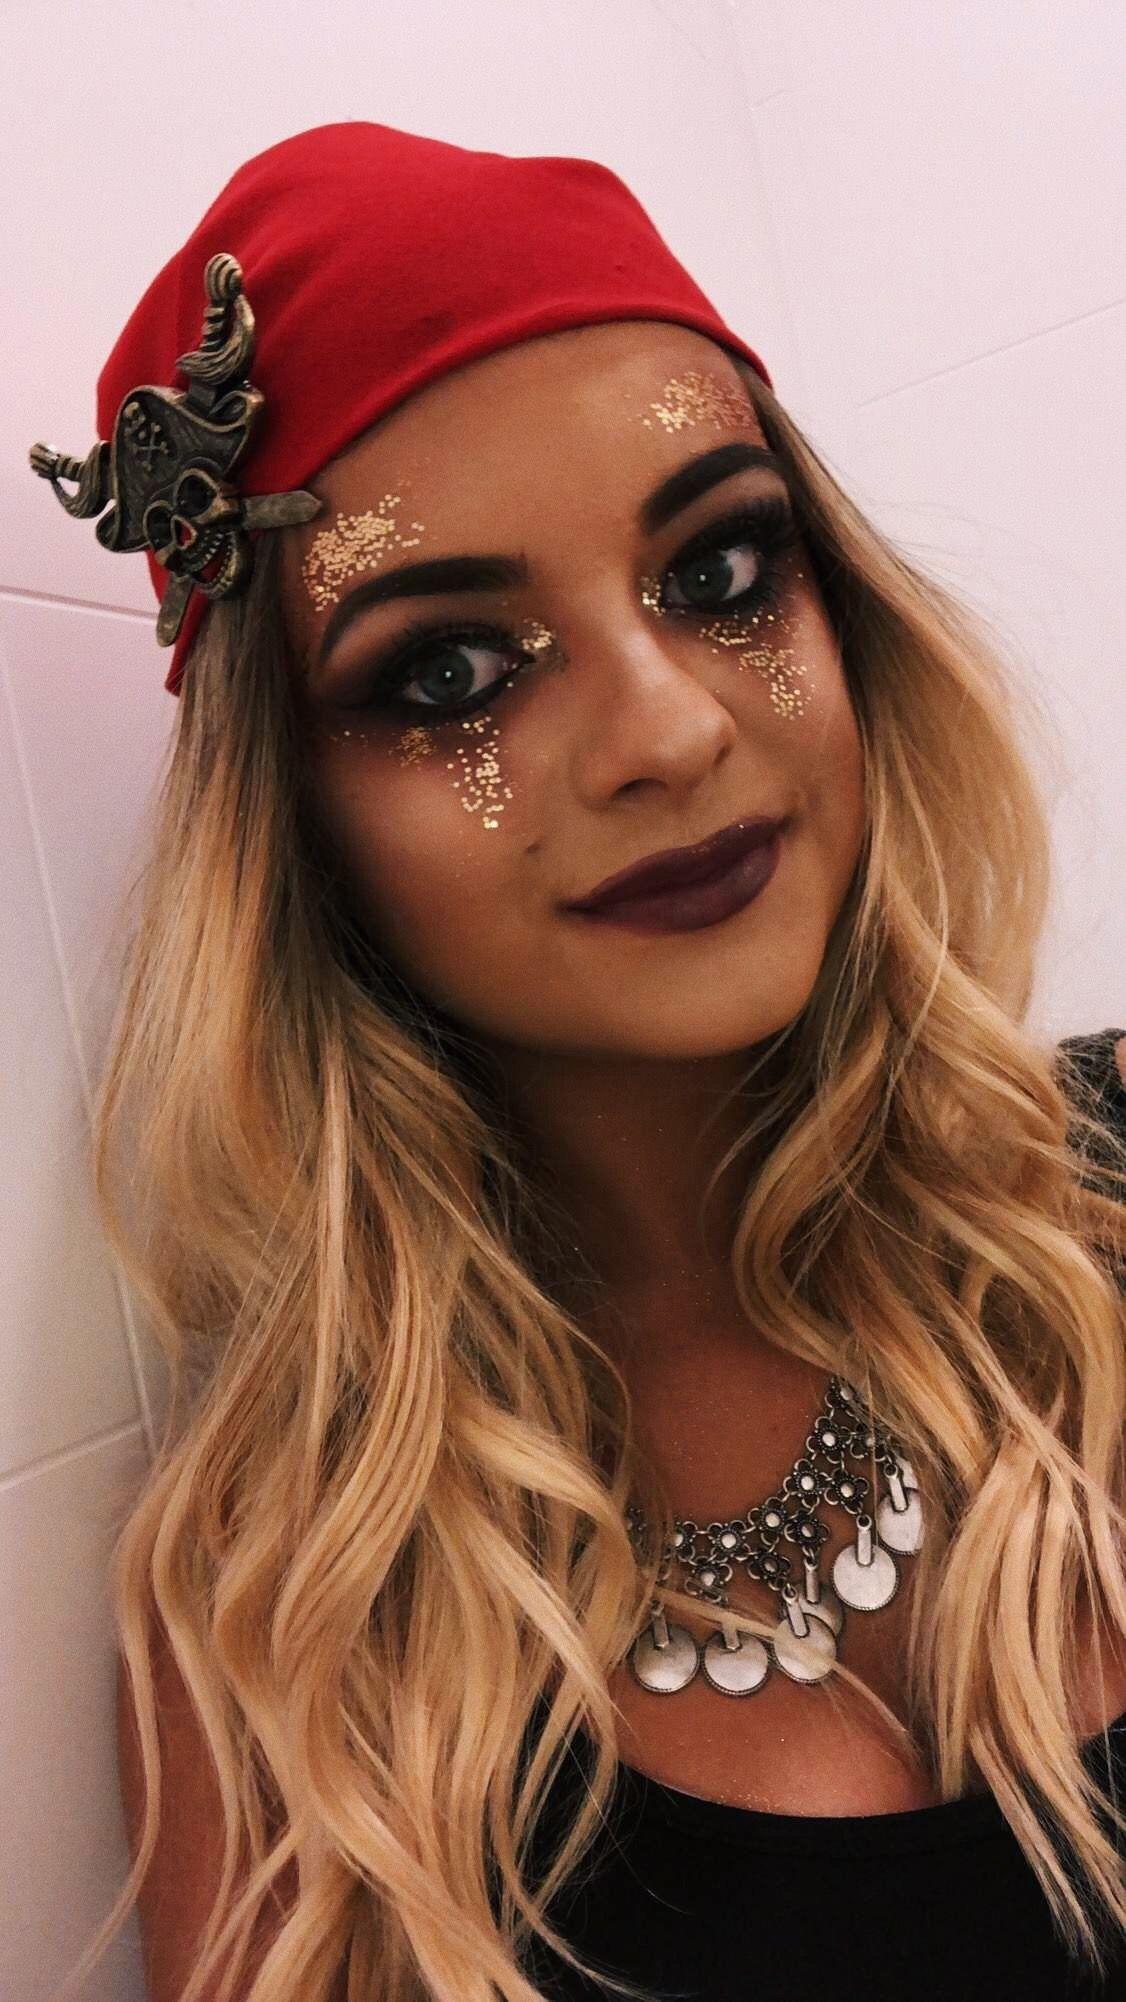 Pirate Halloween Makeup Pirate Halloween Makeup Effektive Bilder Die Wir Uber Decoracion De In 2020 Pirat Schminken Frau Halloween Kleidung Fasching Schminken Pirat